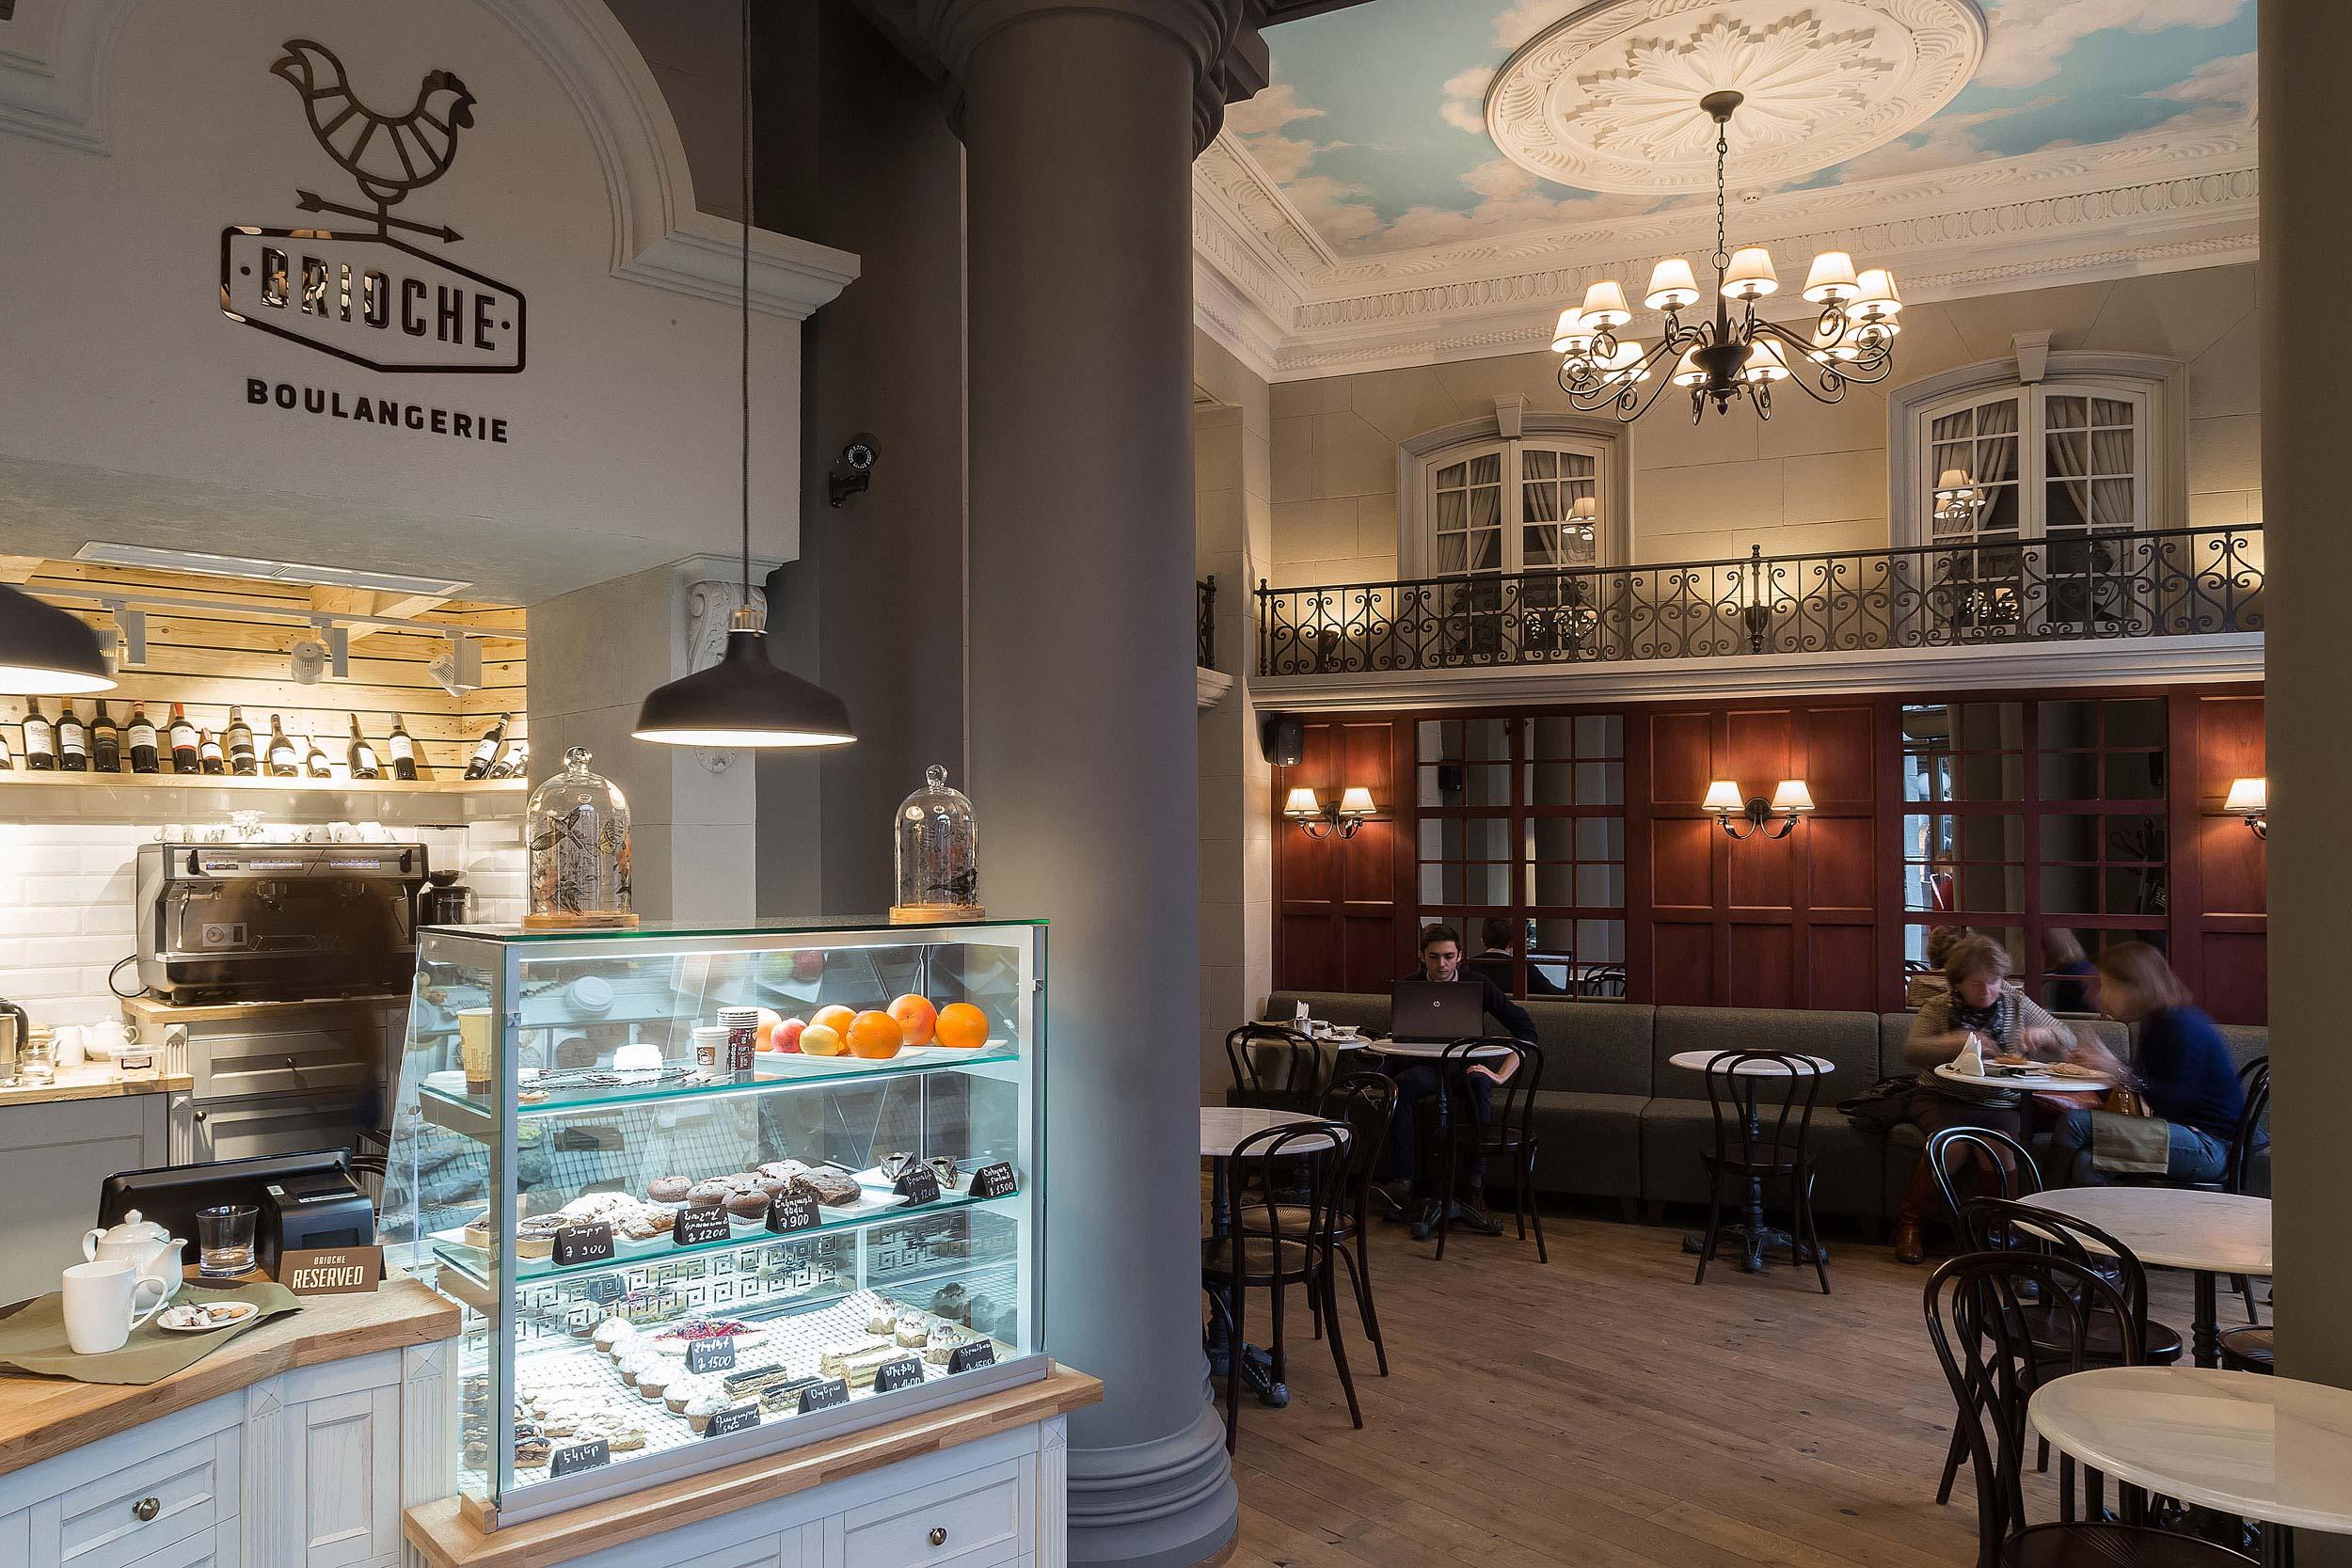 fotografiya vida iz torgovogo zala kafe-pekarni BRIOSH na zal-kafe